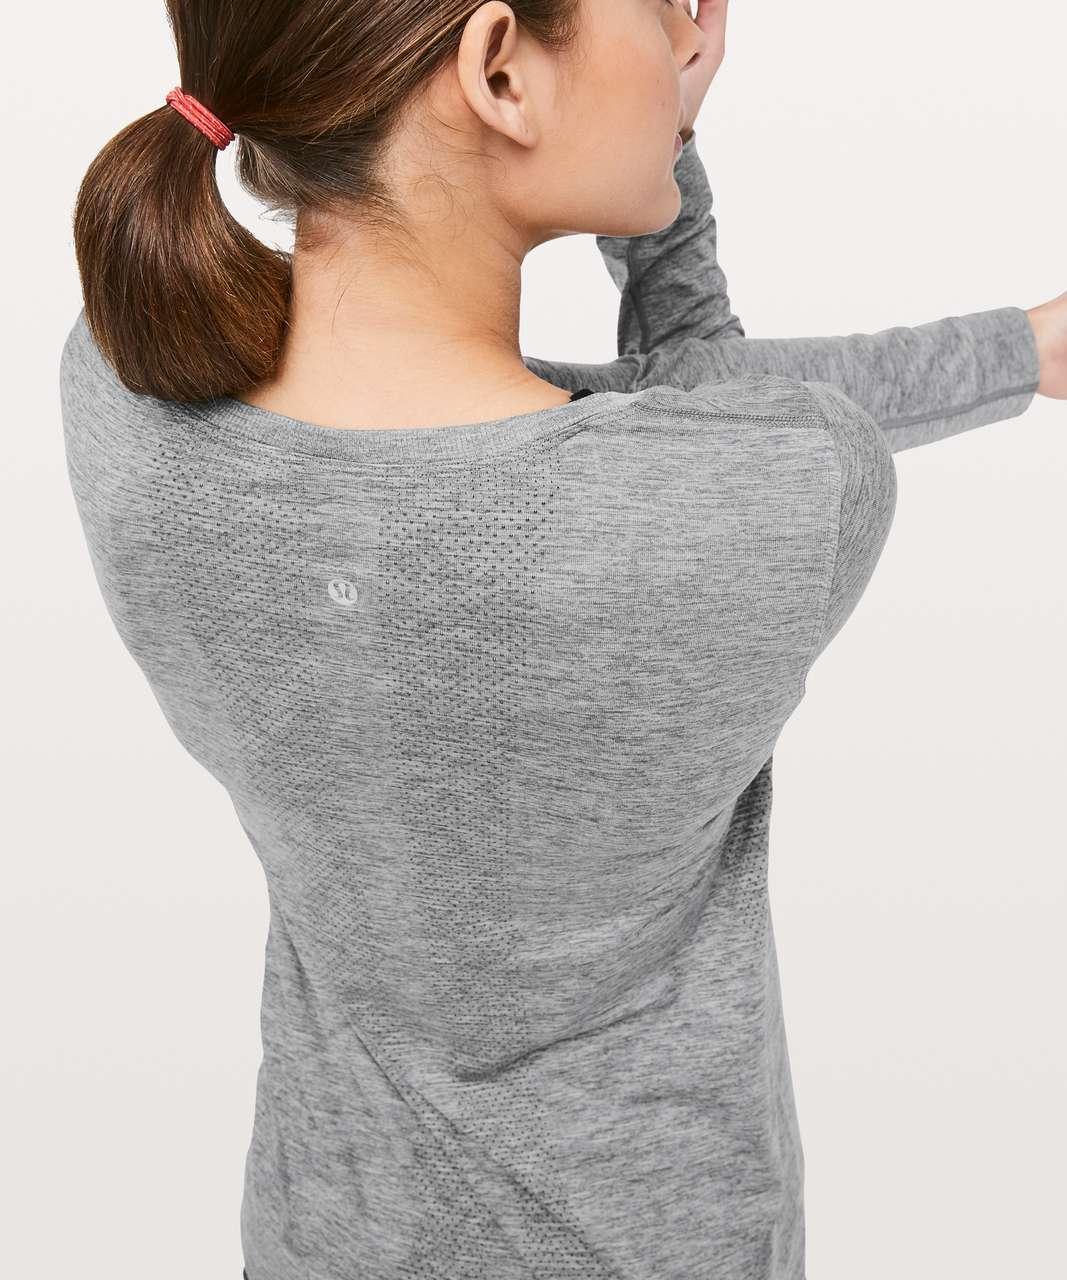 Lululemon Swiftly Tech Long Sleeve (Breeze) *Relaxed Fit - Slate / White